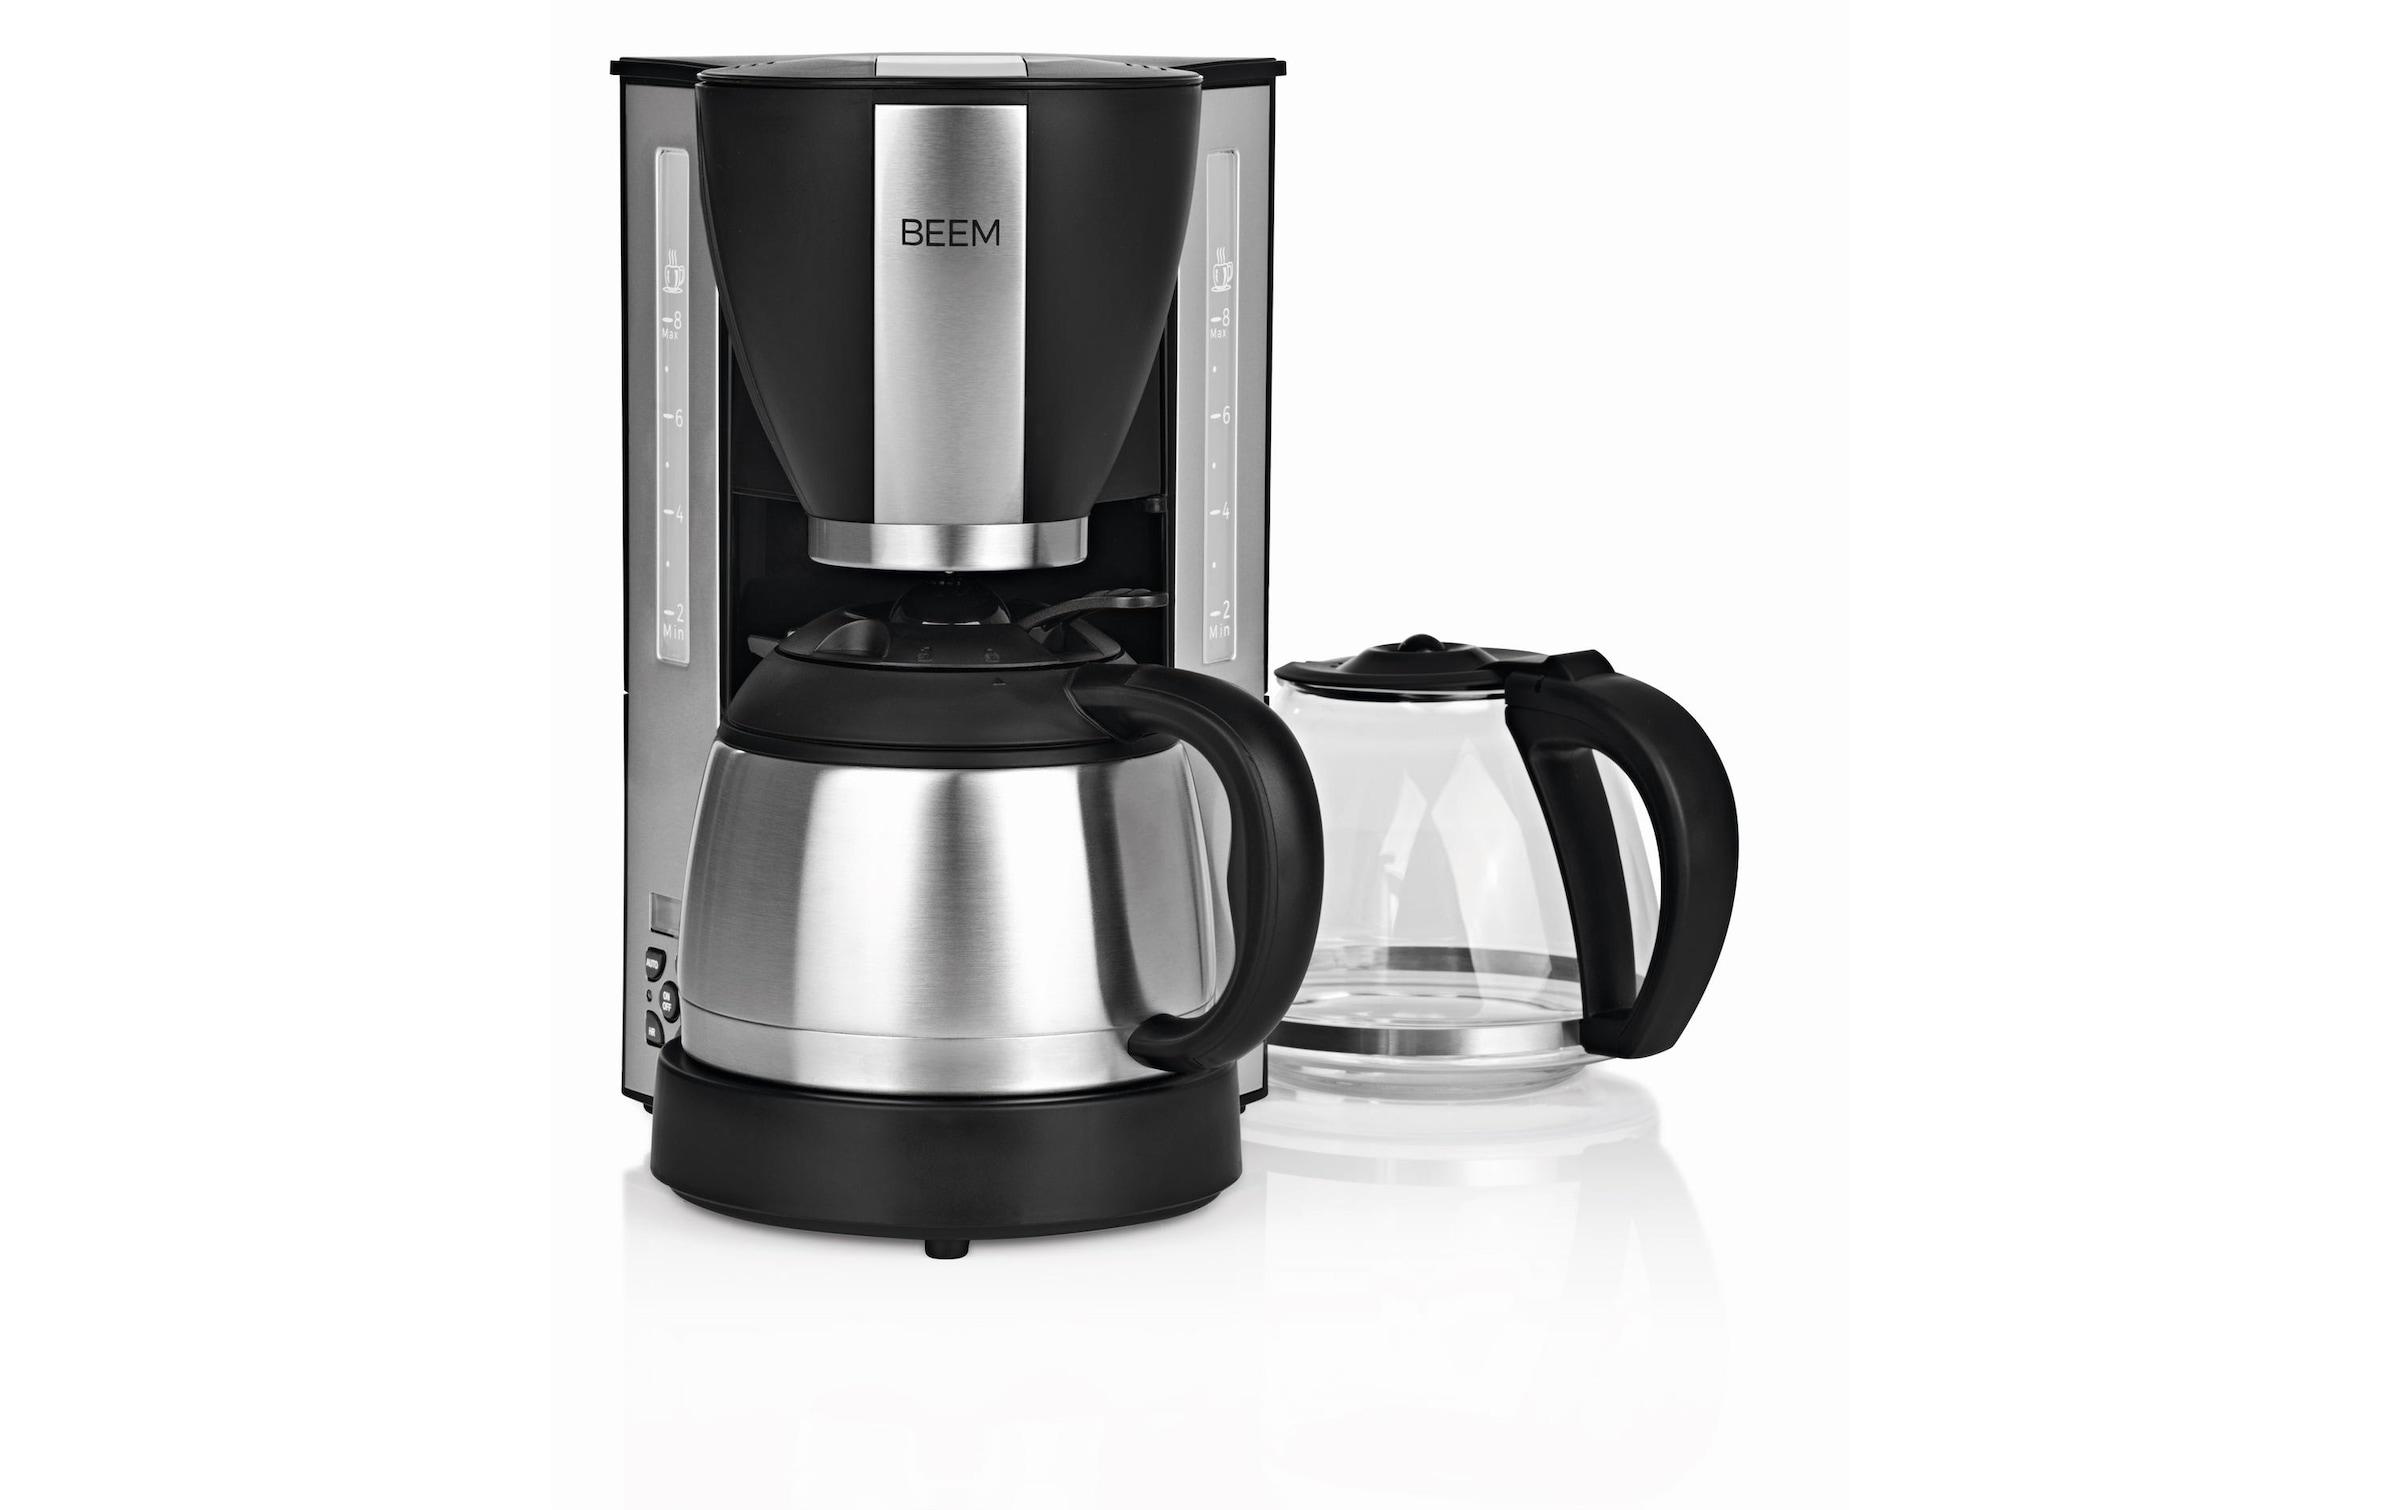 Image of BEEM Filterkaffeemaschine »BEEM Filterkaffeemaschine Fresh Aro«, Timer, Tropfstopp, Überhitzungsschutz